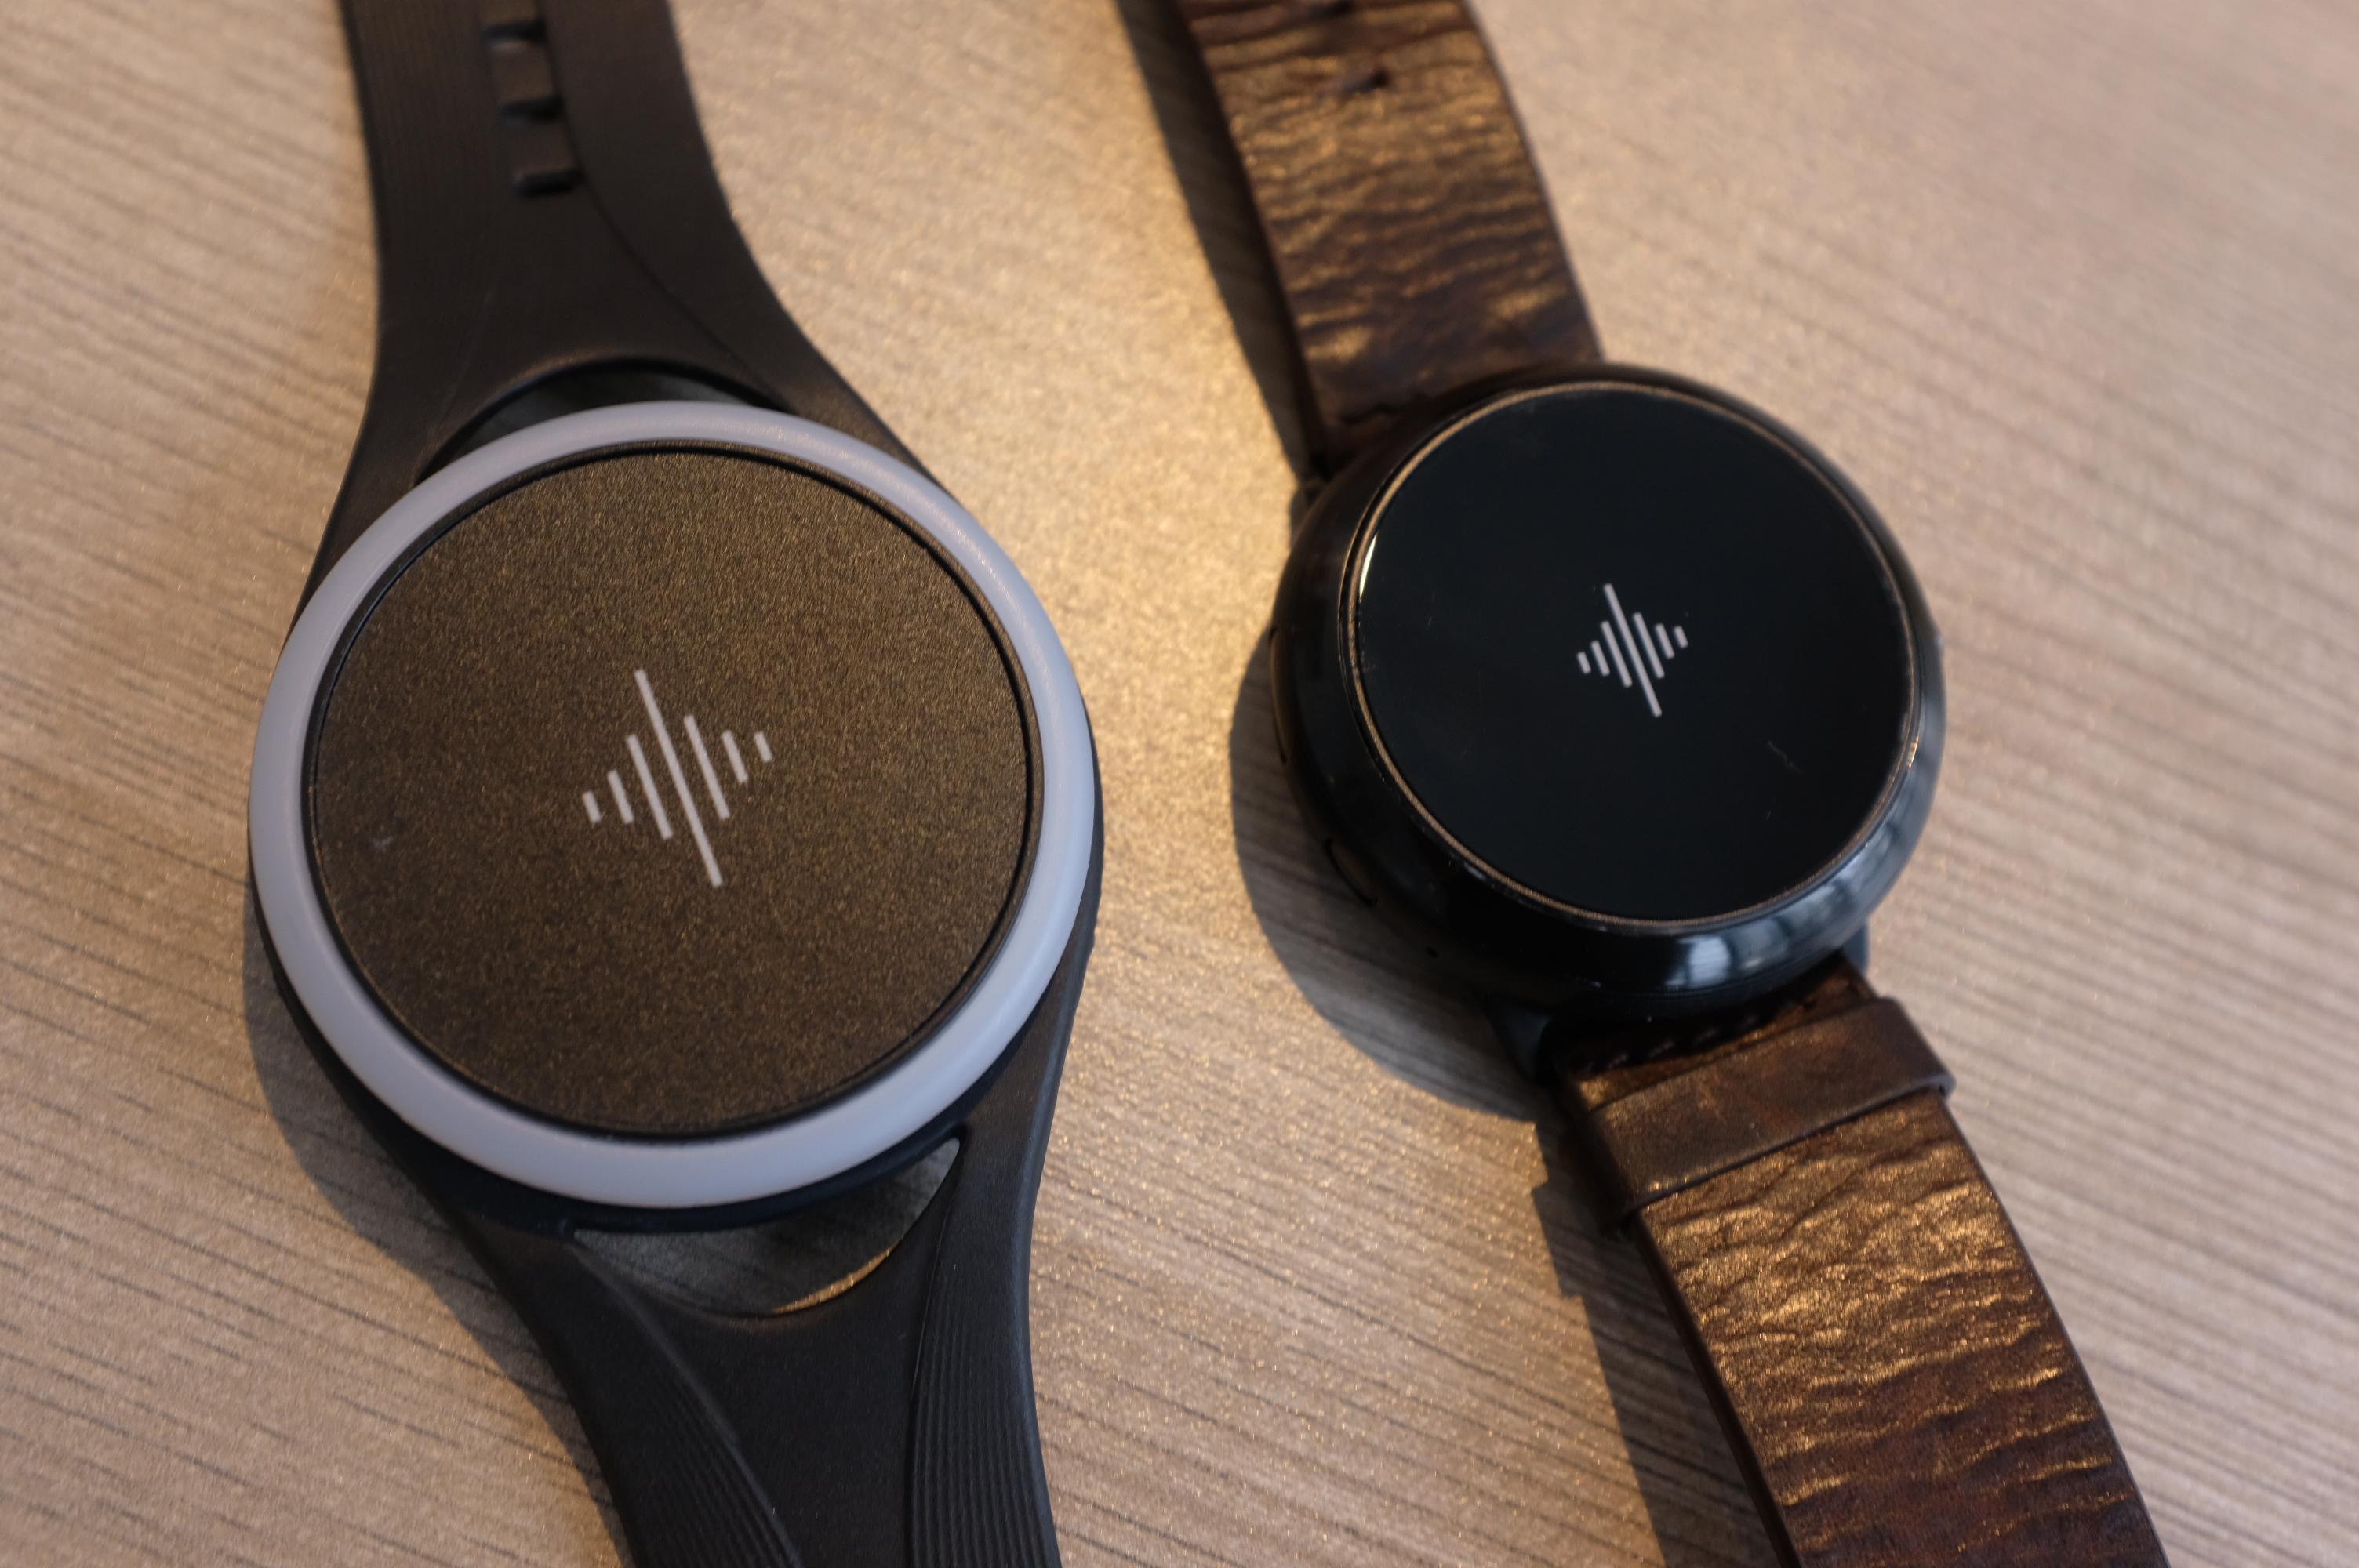 Soundbrenner's wearable metronome gets a modular upgrade DSCF3345